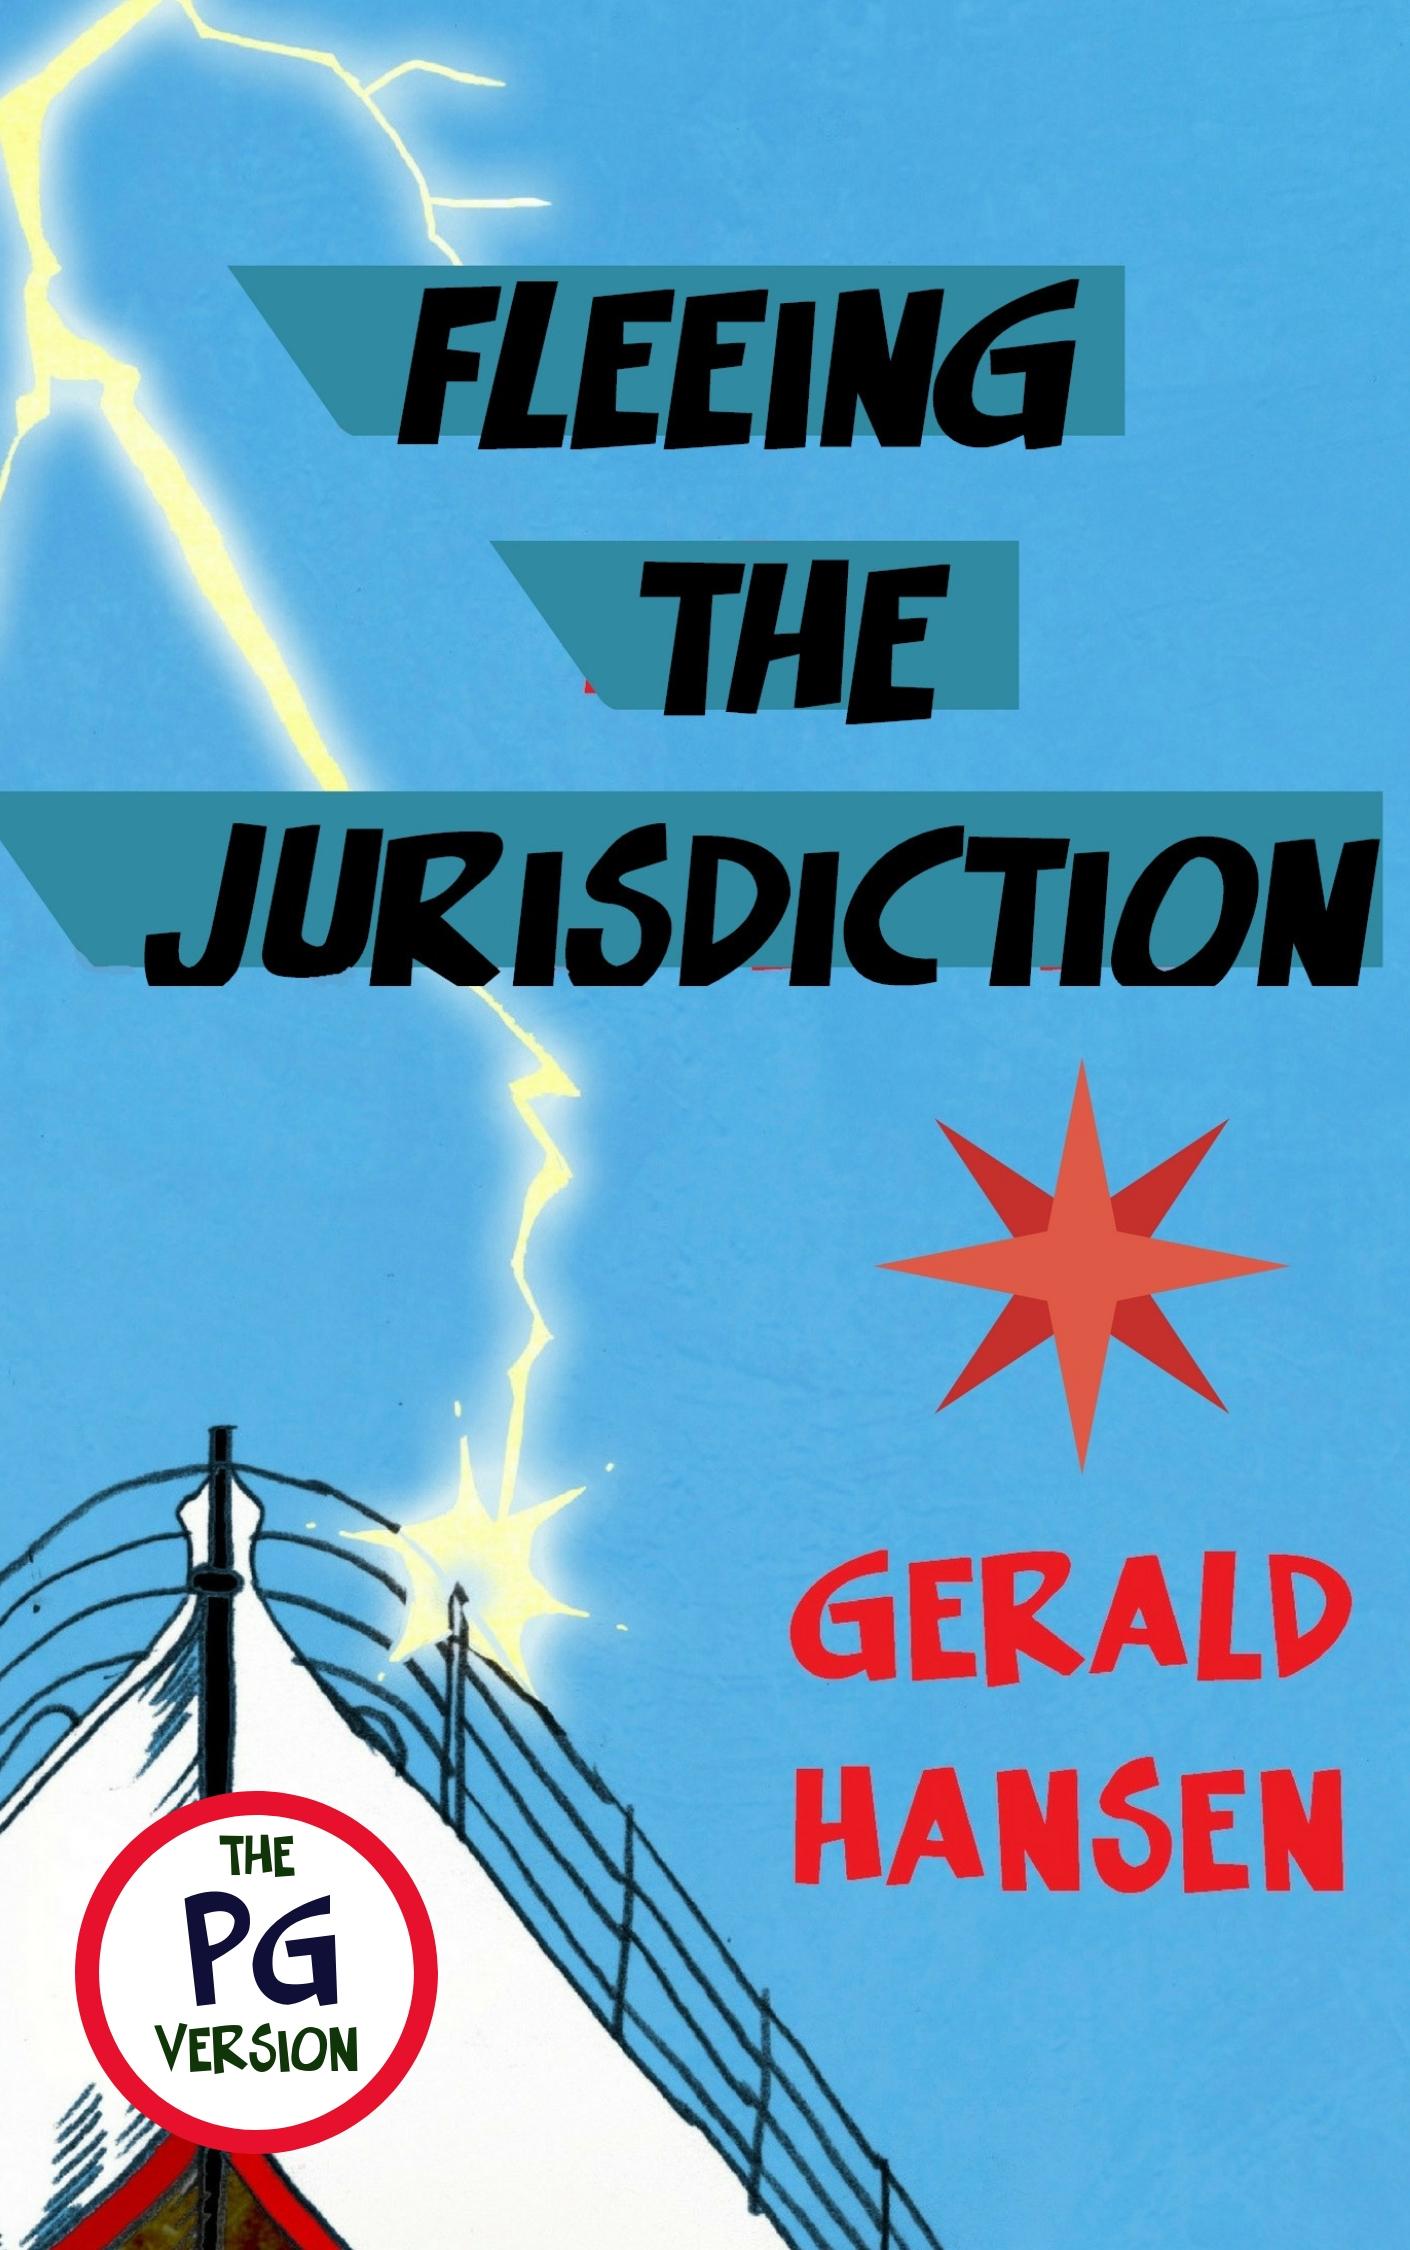 Fleeing The Jurisdiction